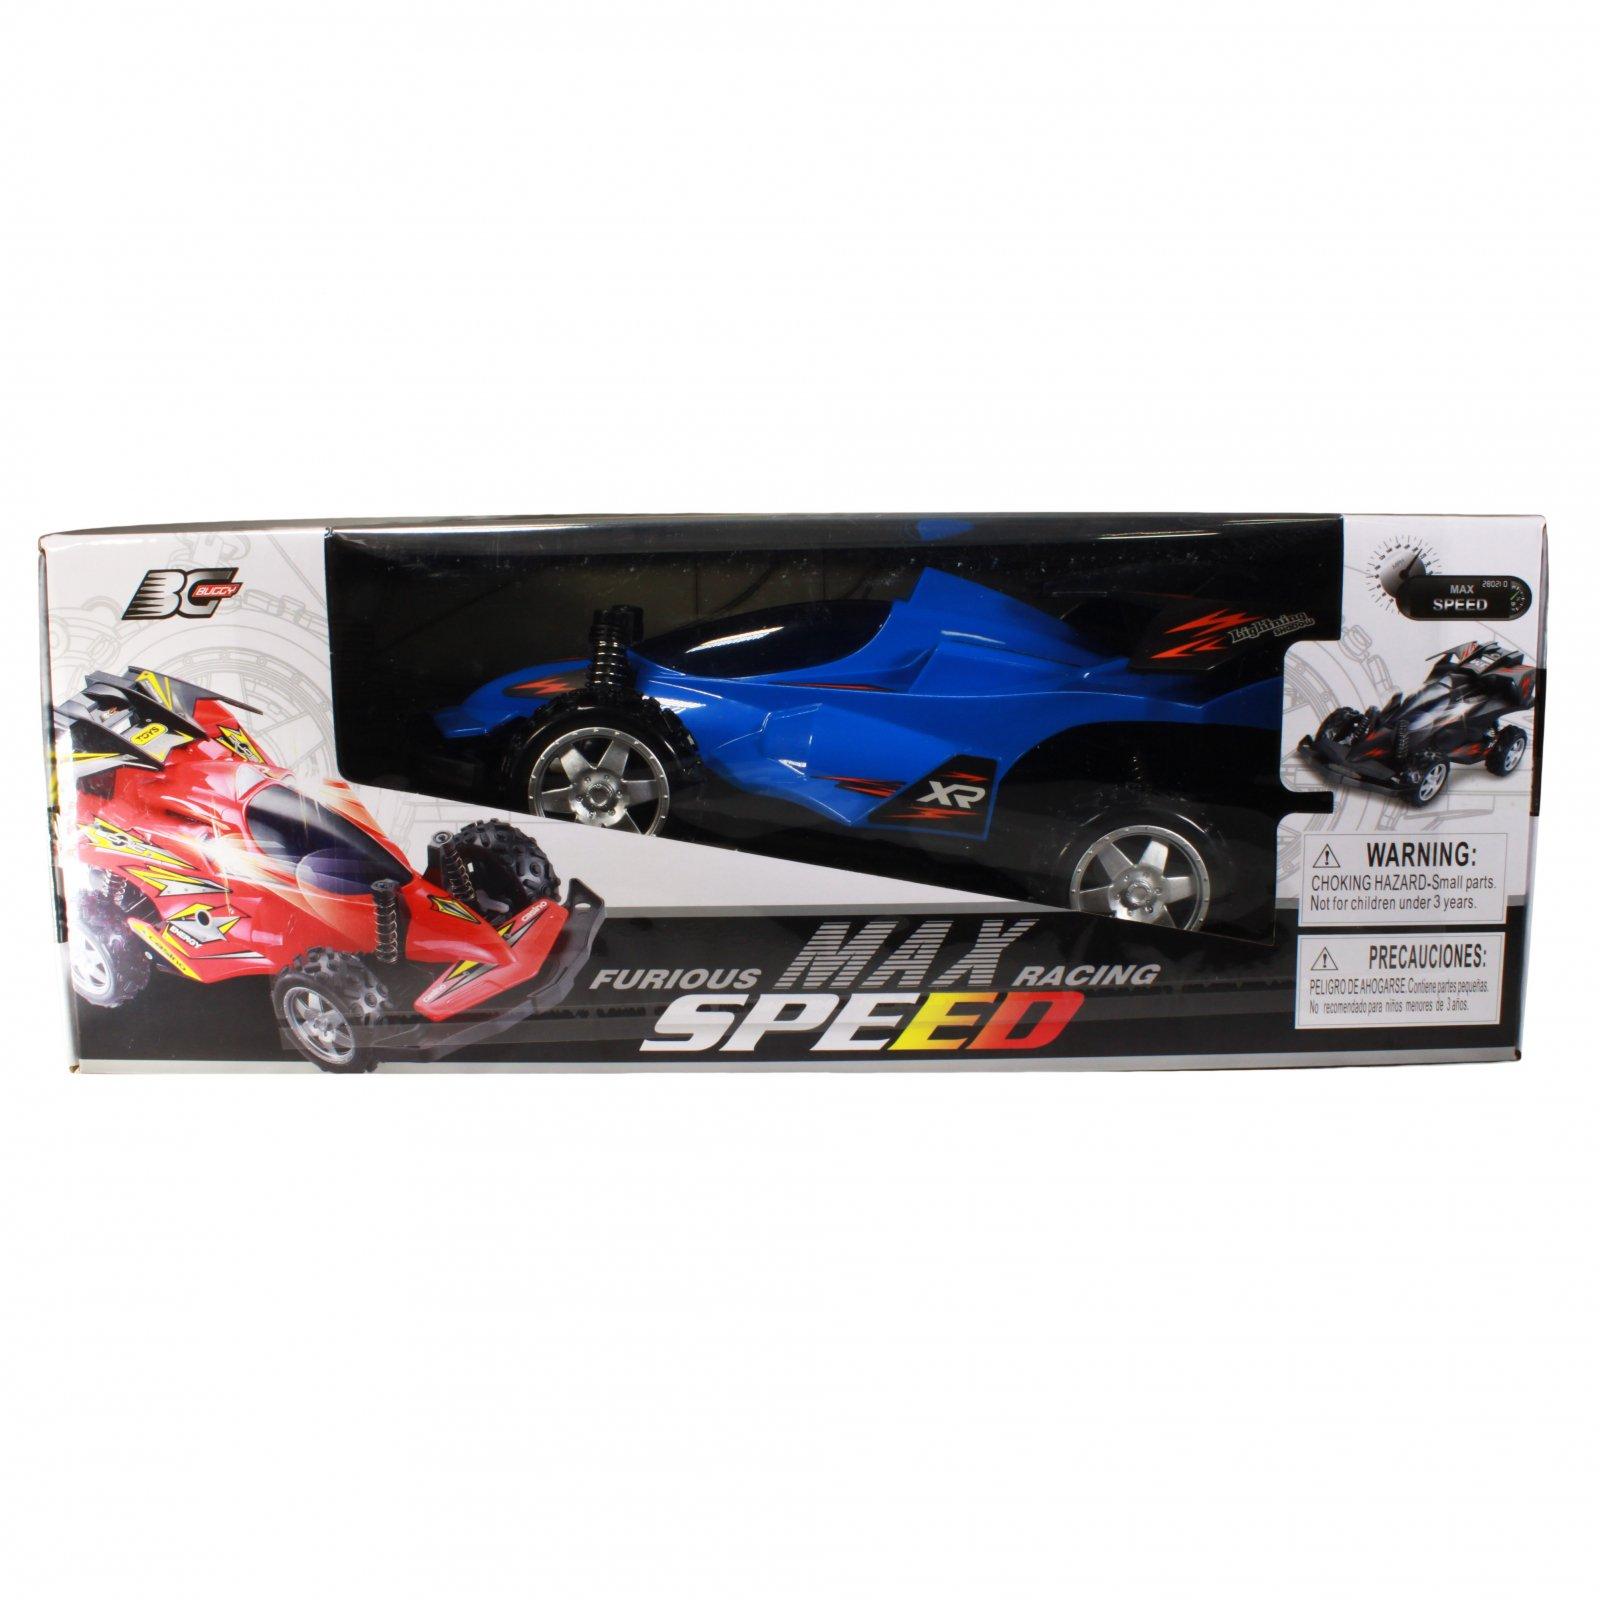 High Speed R/C Dune Buggy Vehicle - Blue